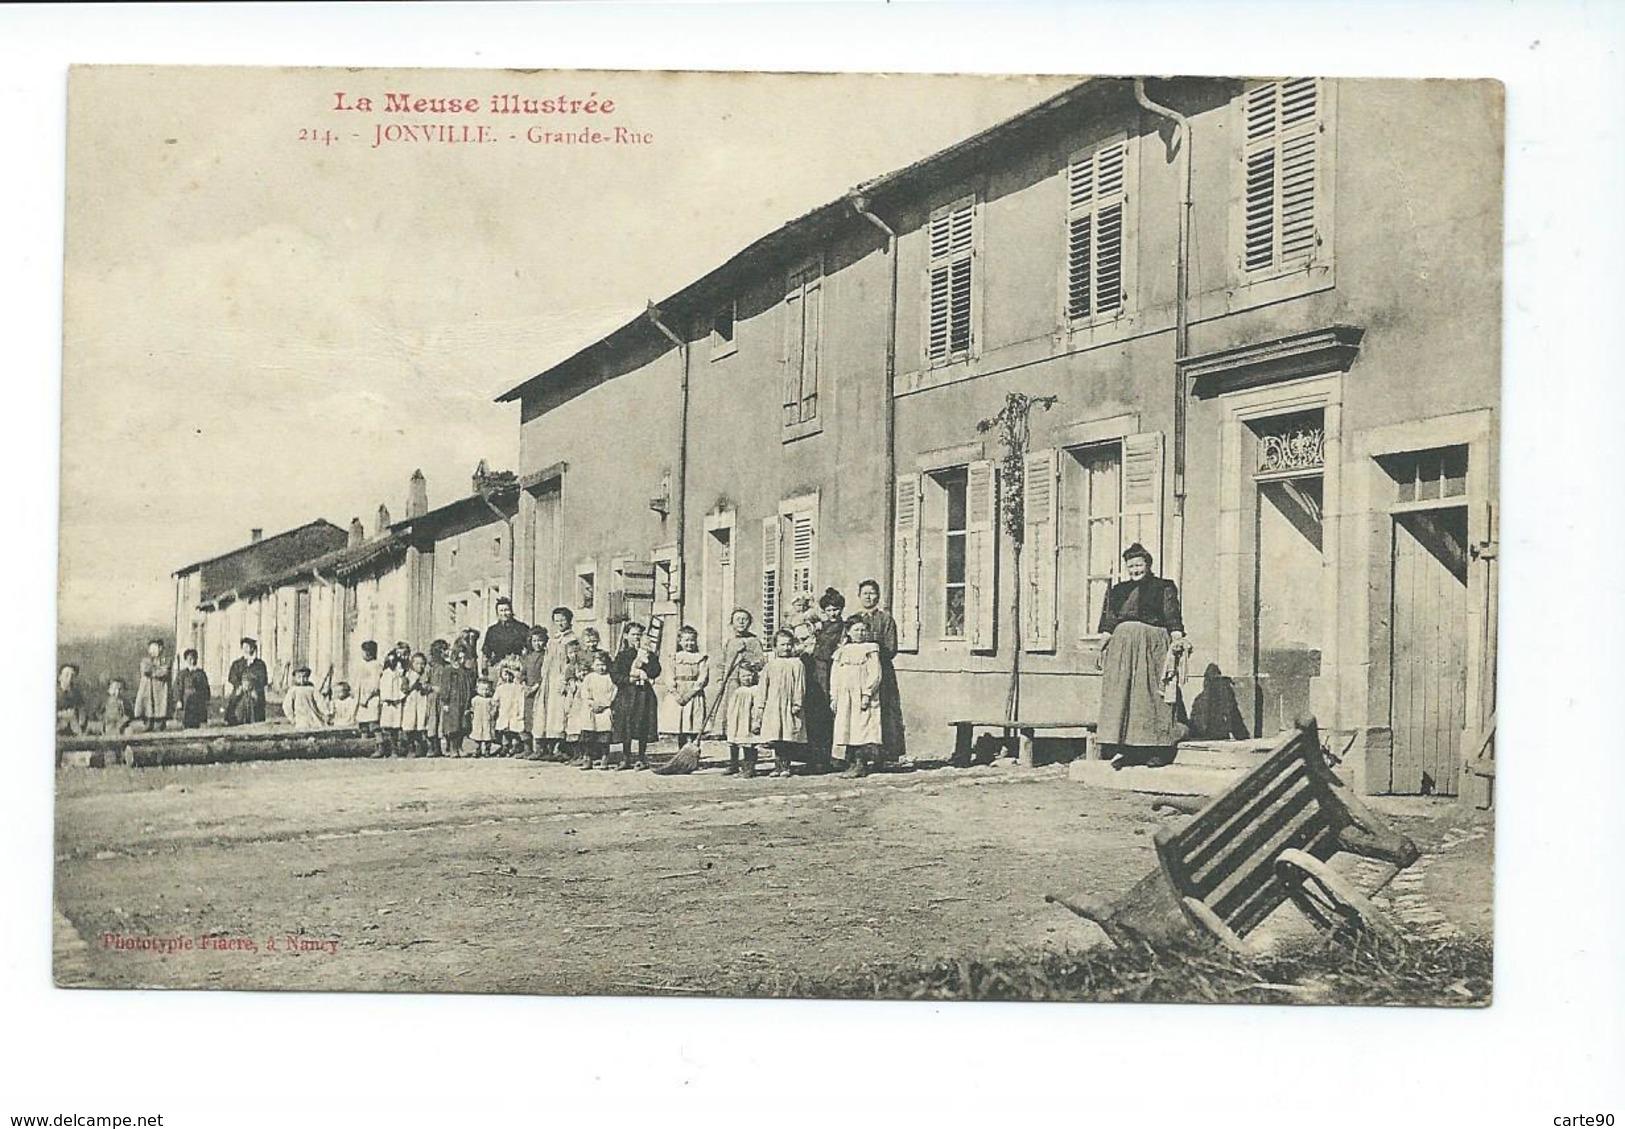 CPA JONVILLE - GRANDE RUE - LA MEUSE ILLUSTREE - TRES ANIMEE - France